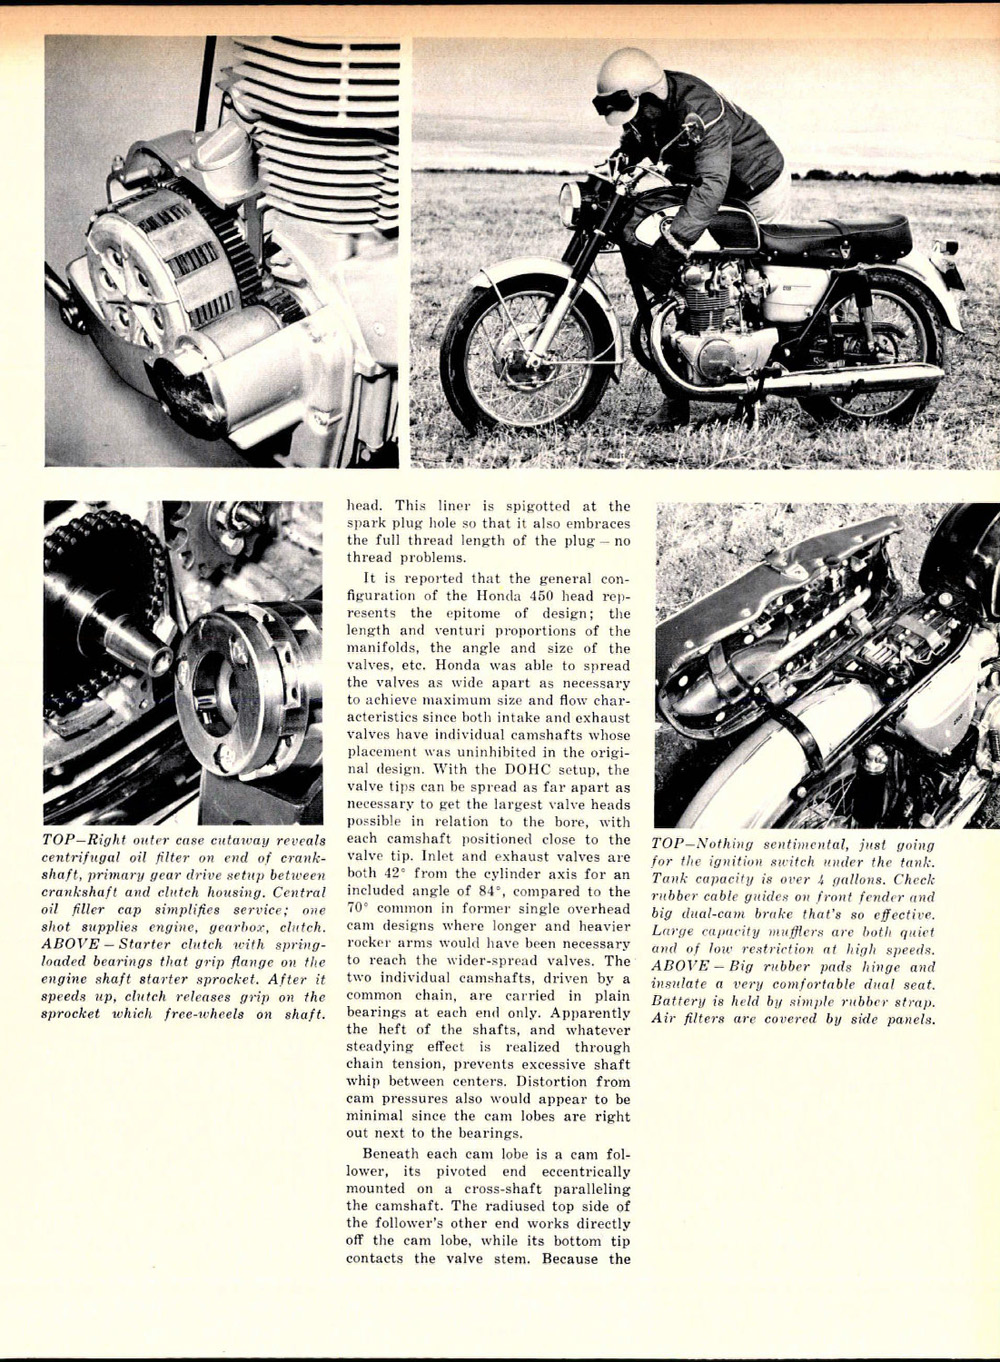 Honda 450 Engine tech article 05.jpg